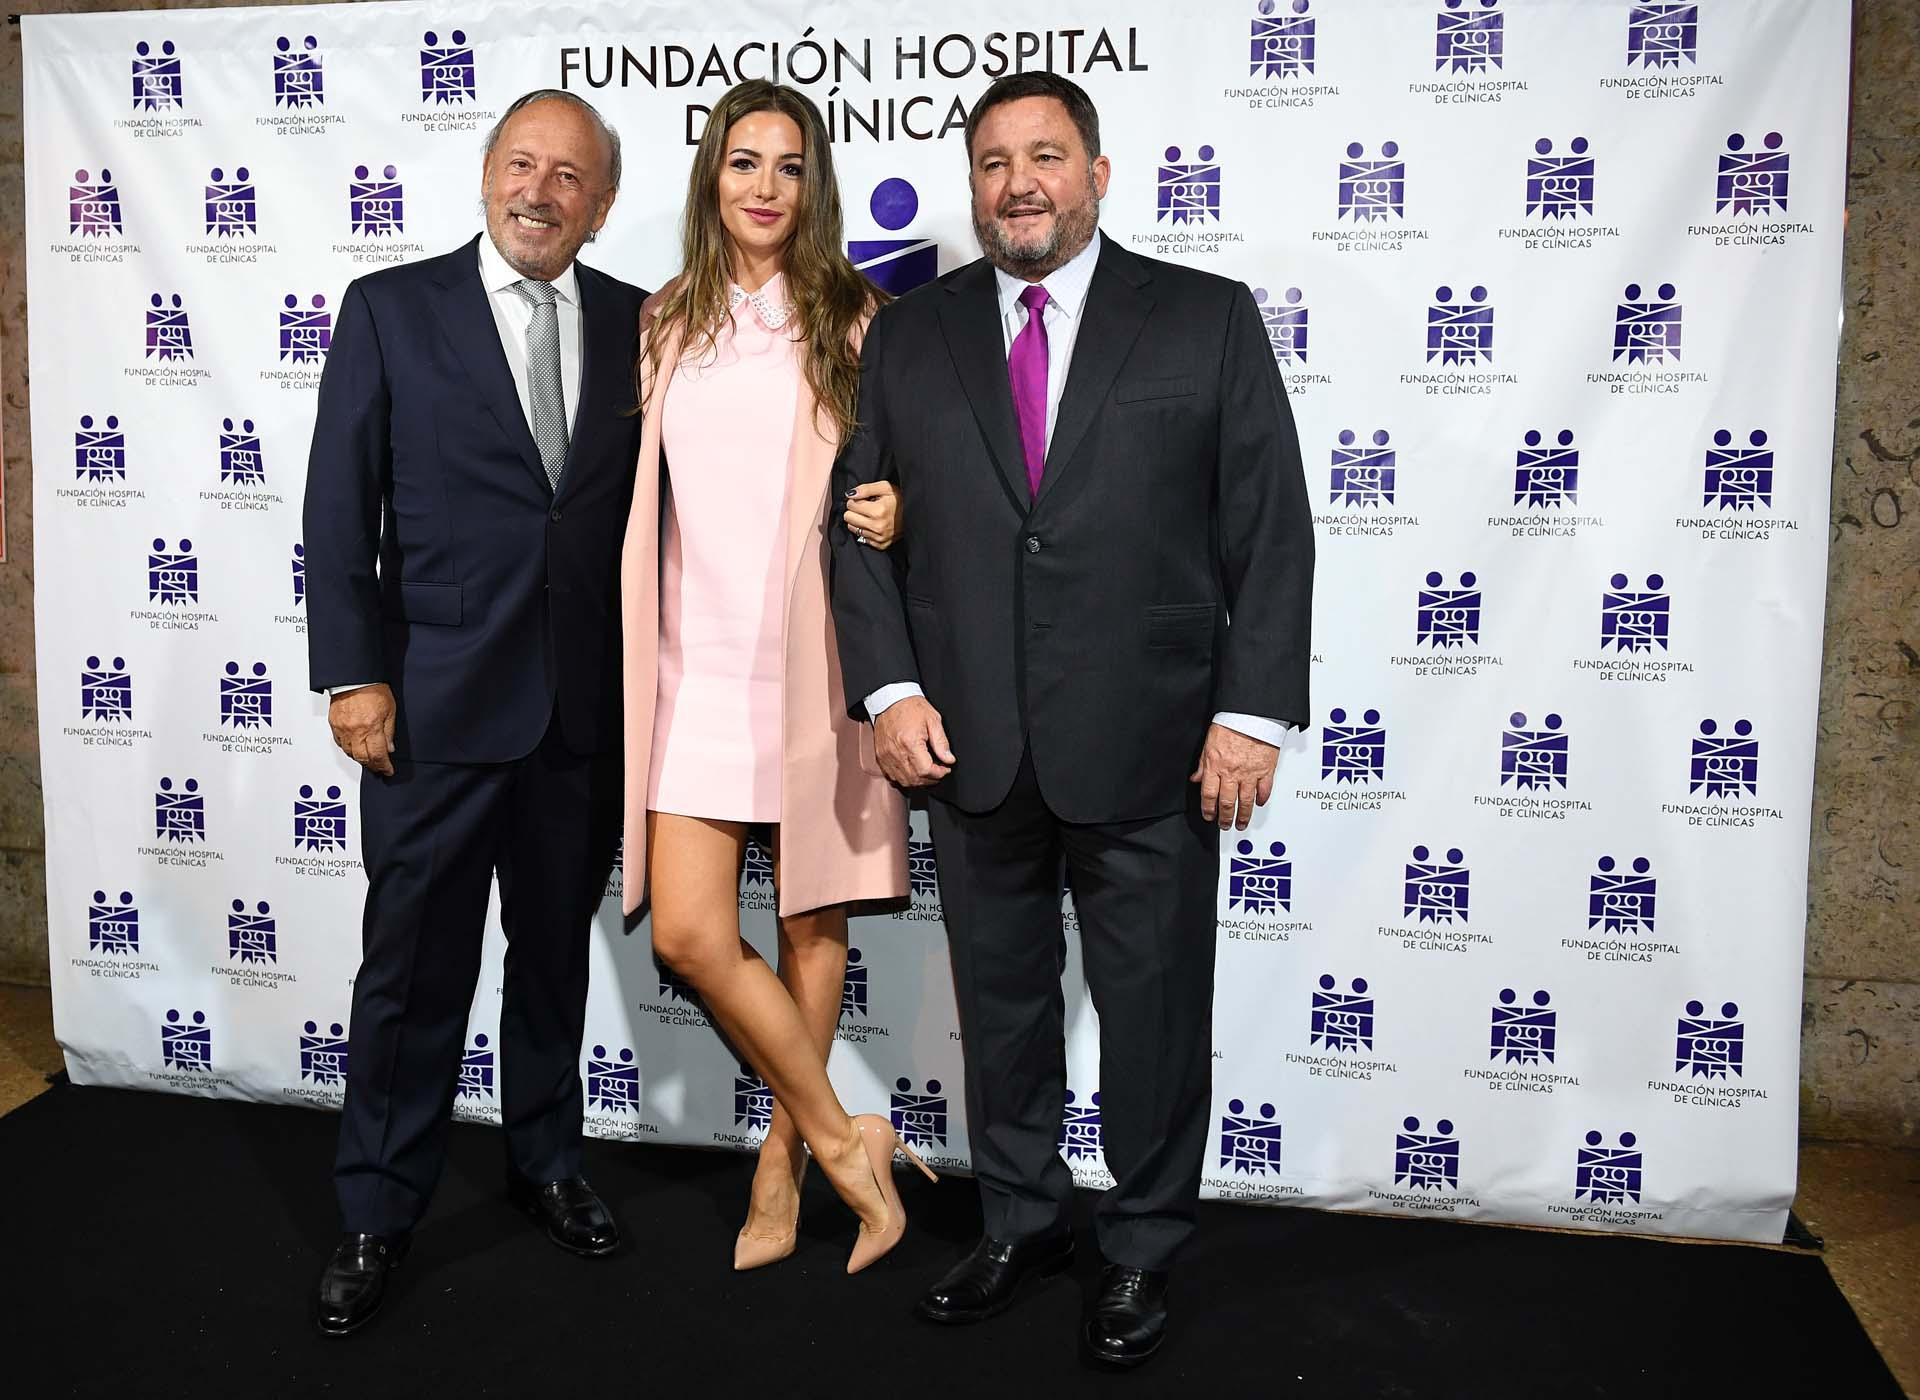 Mauricio Filiberti (Transclor) y su mujer Camila Pitana, junto a Alejandro Macfarlane